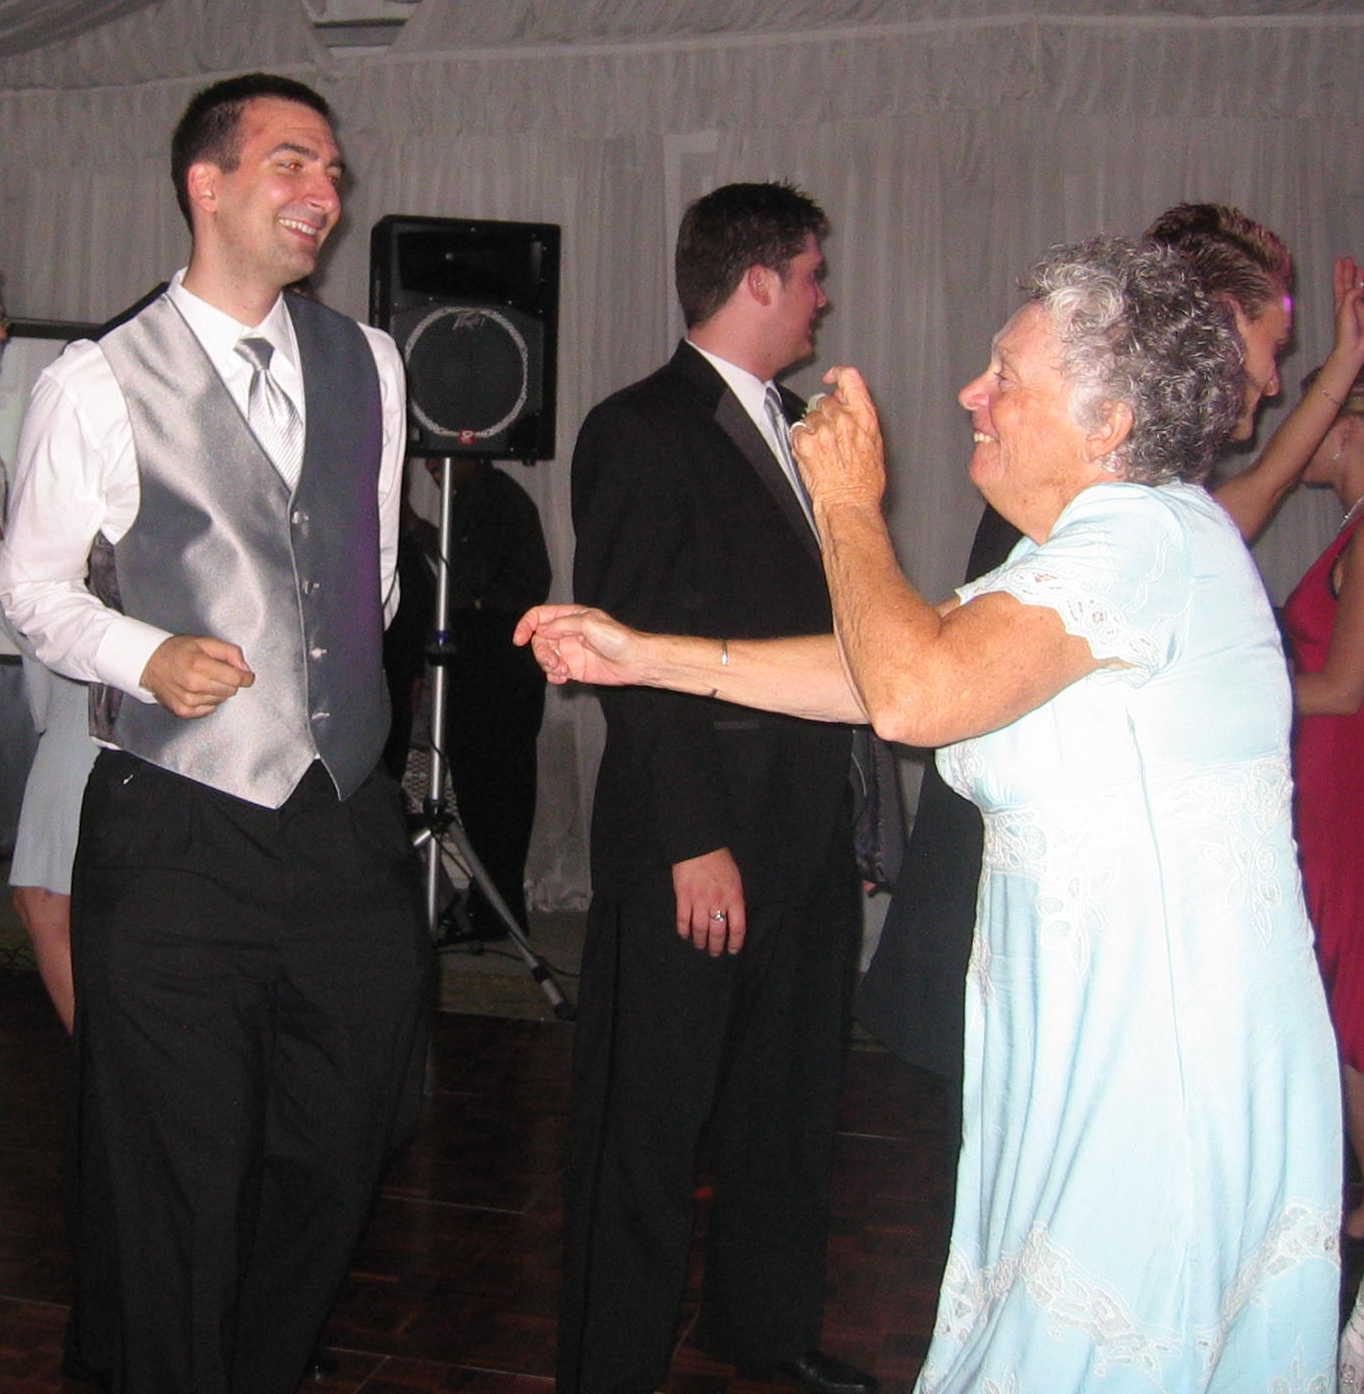 Landlady Dancing